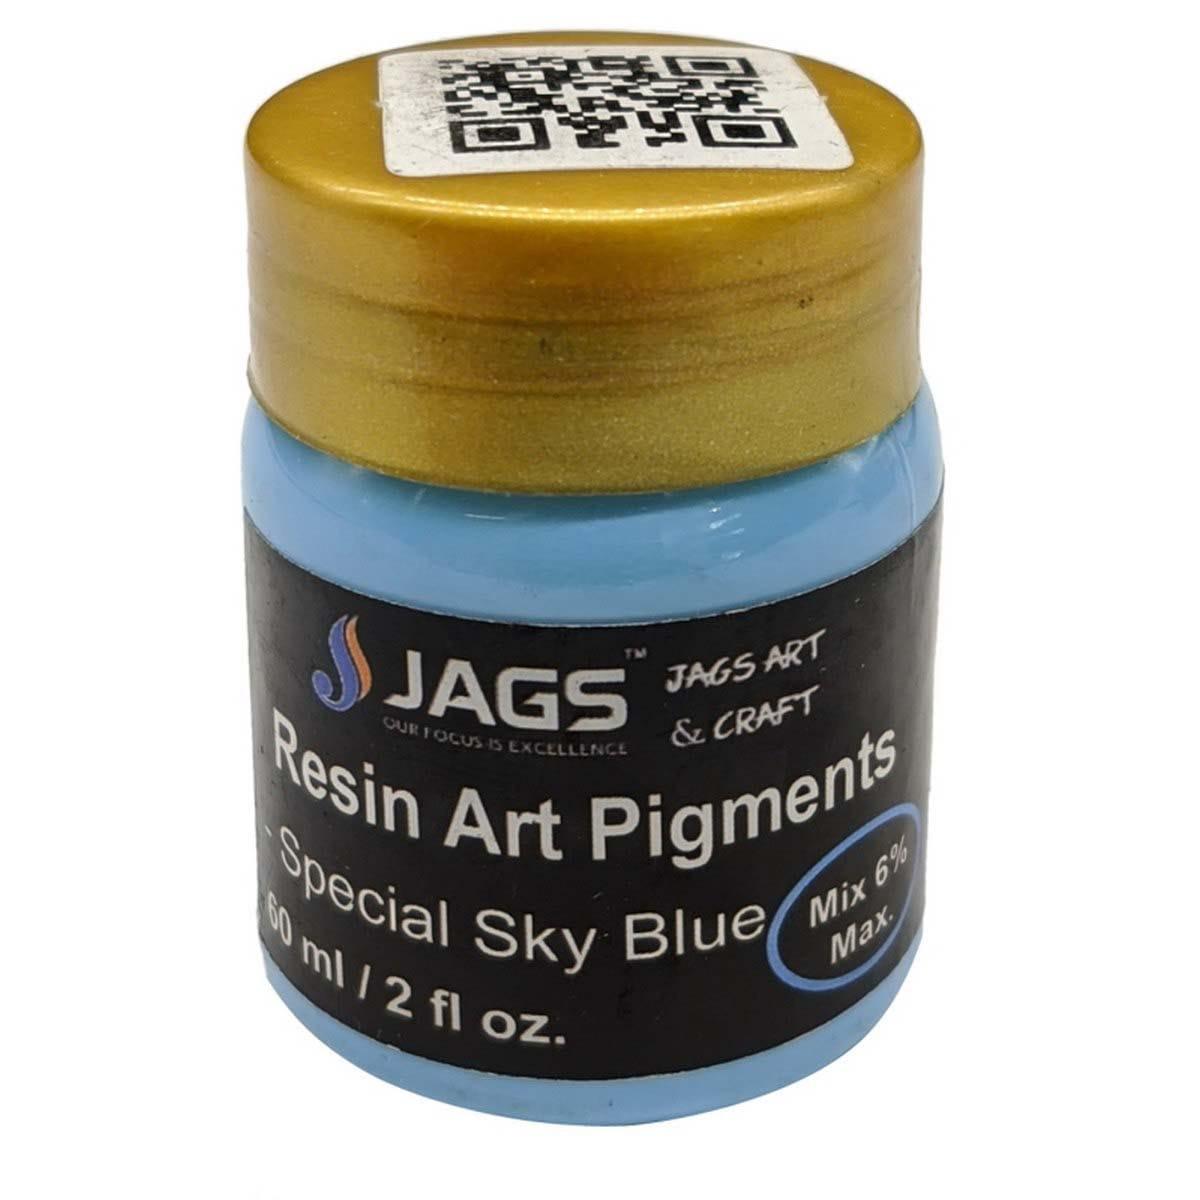 Resin Art Pigments Sky Blue